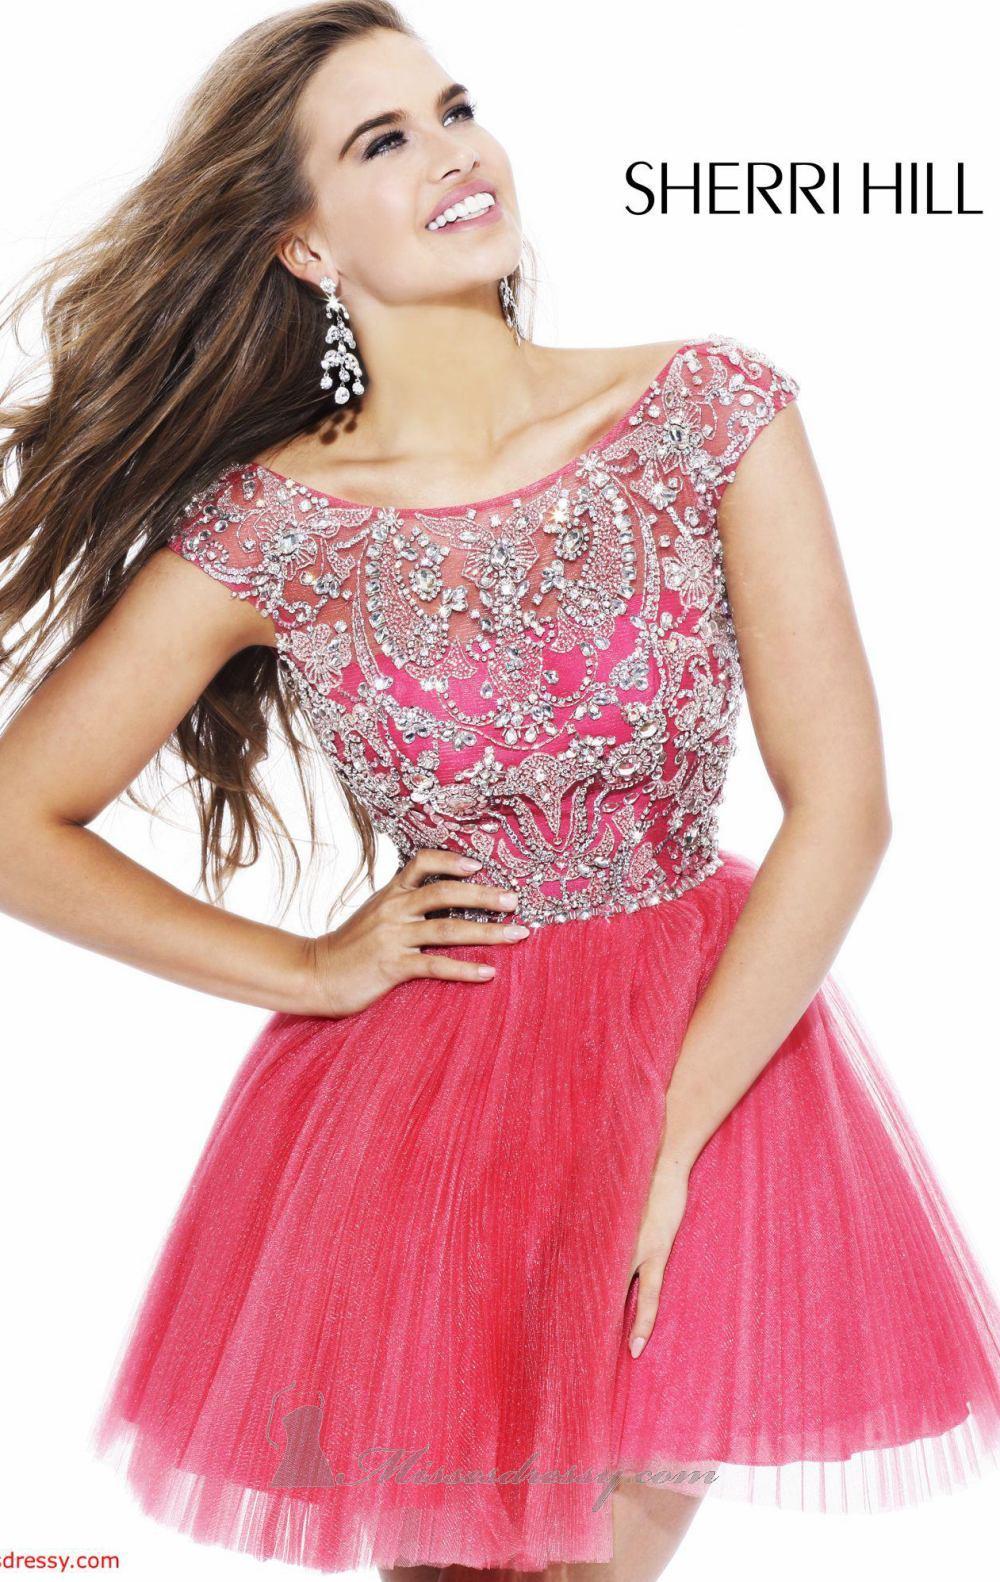 Diva Design: 48 Sherri Hill Prom Dresses 2013